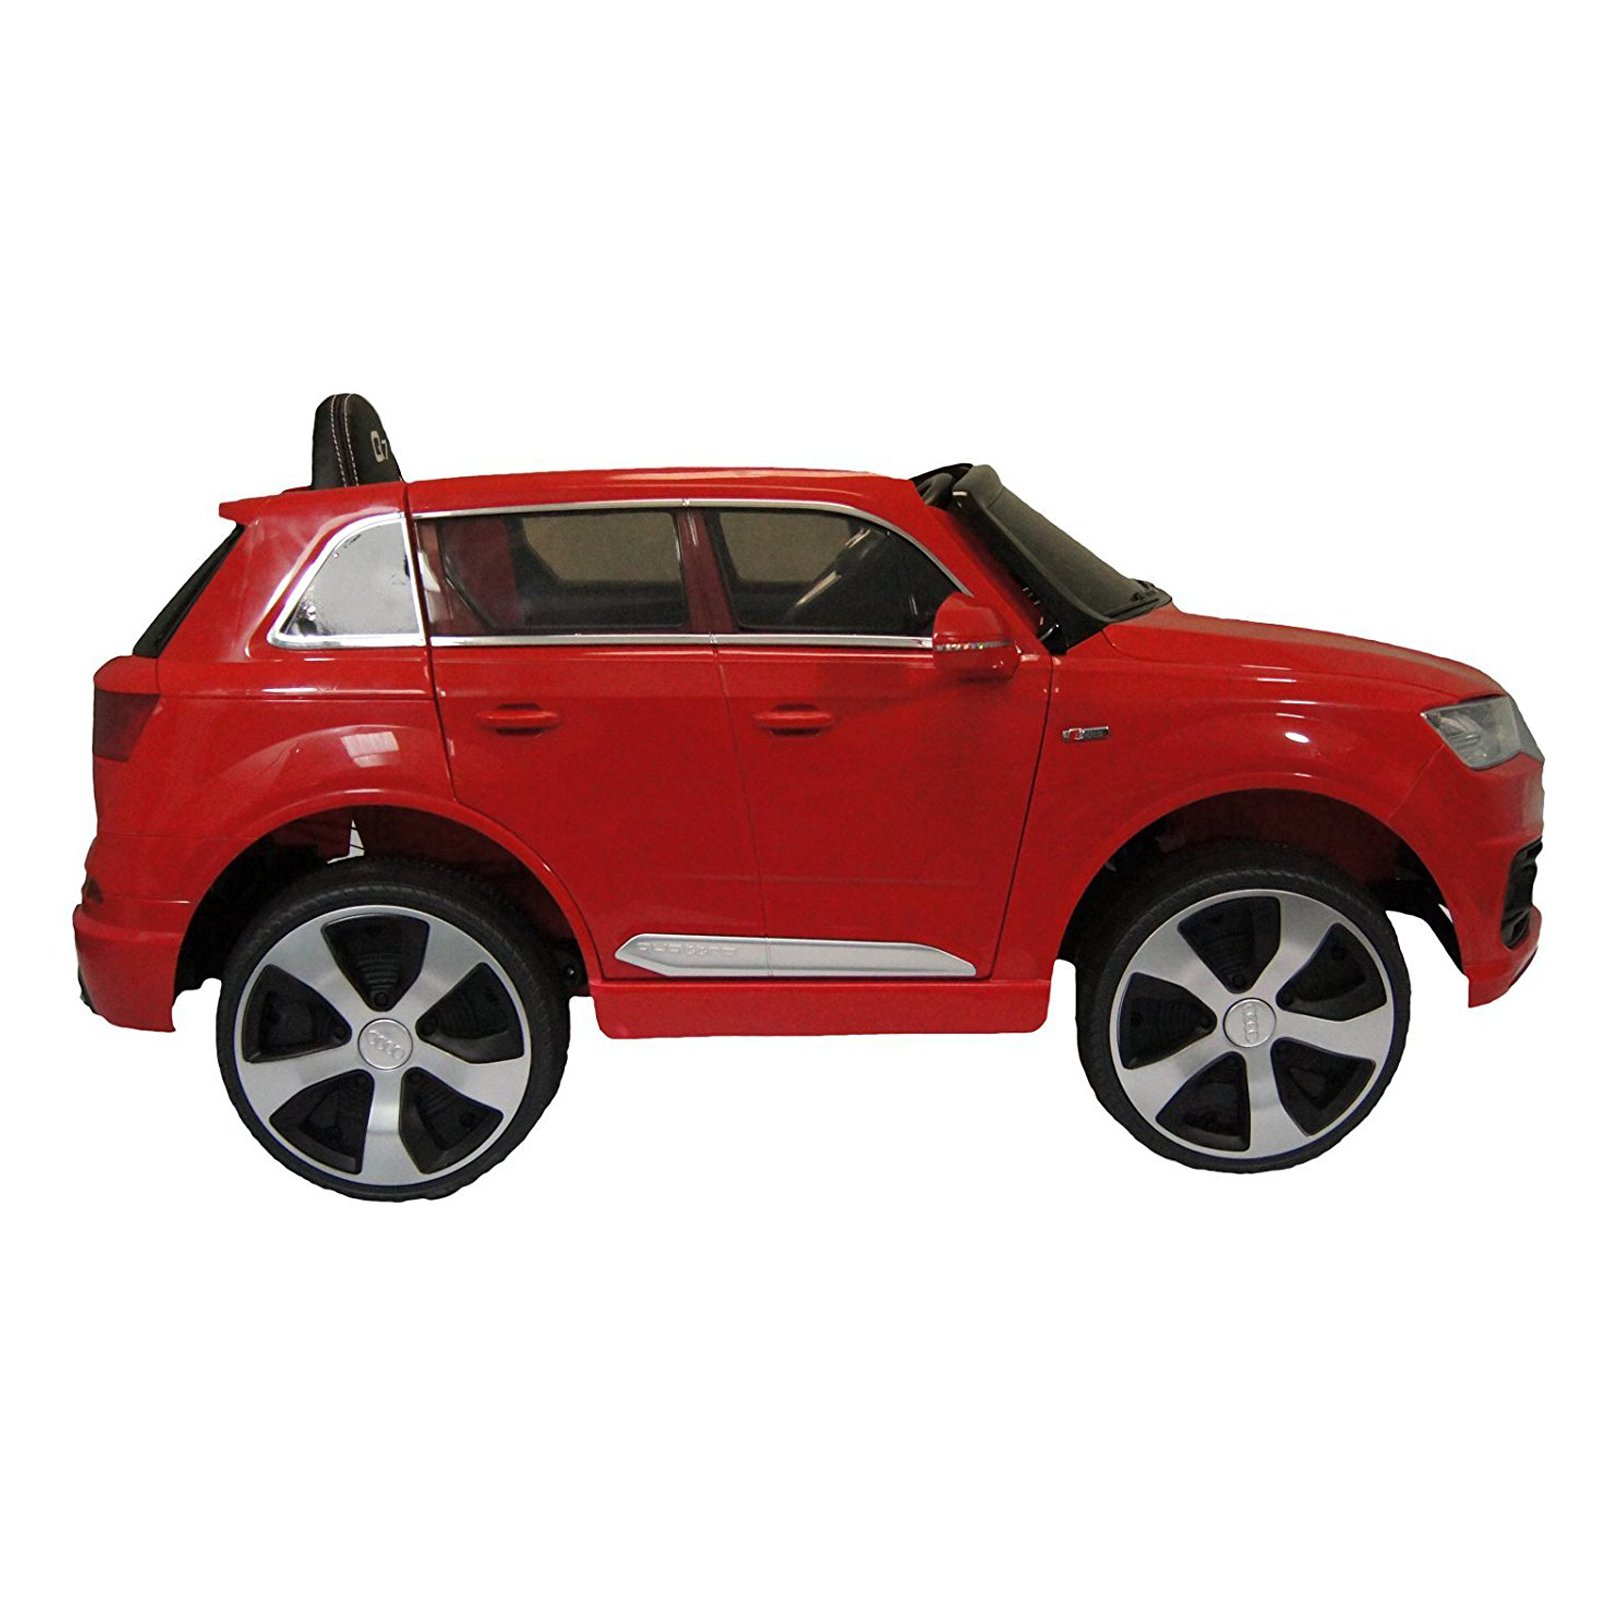 Kids Ride On Car Audi Q7 12V Battery - Red